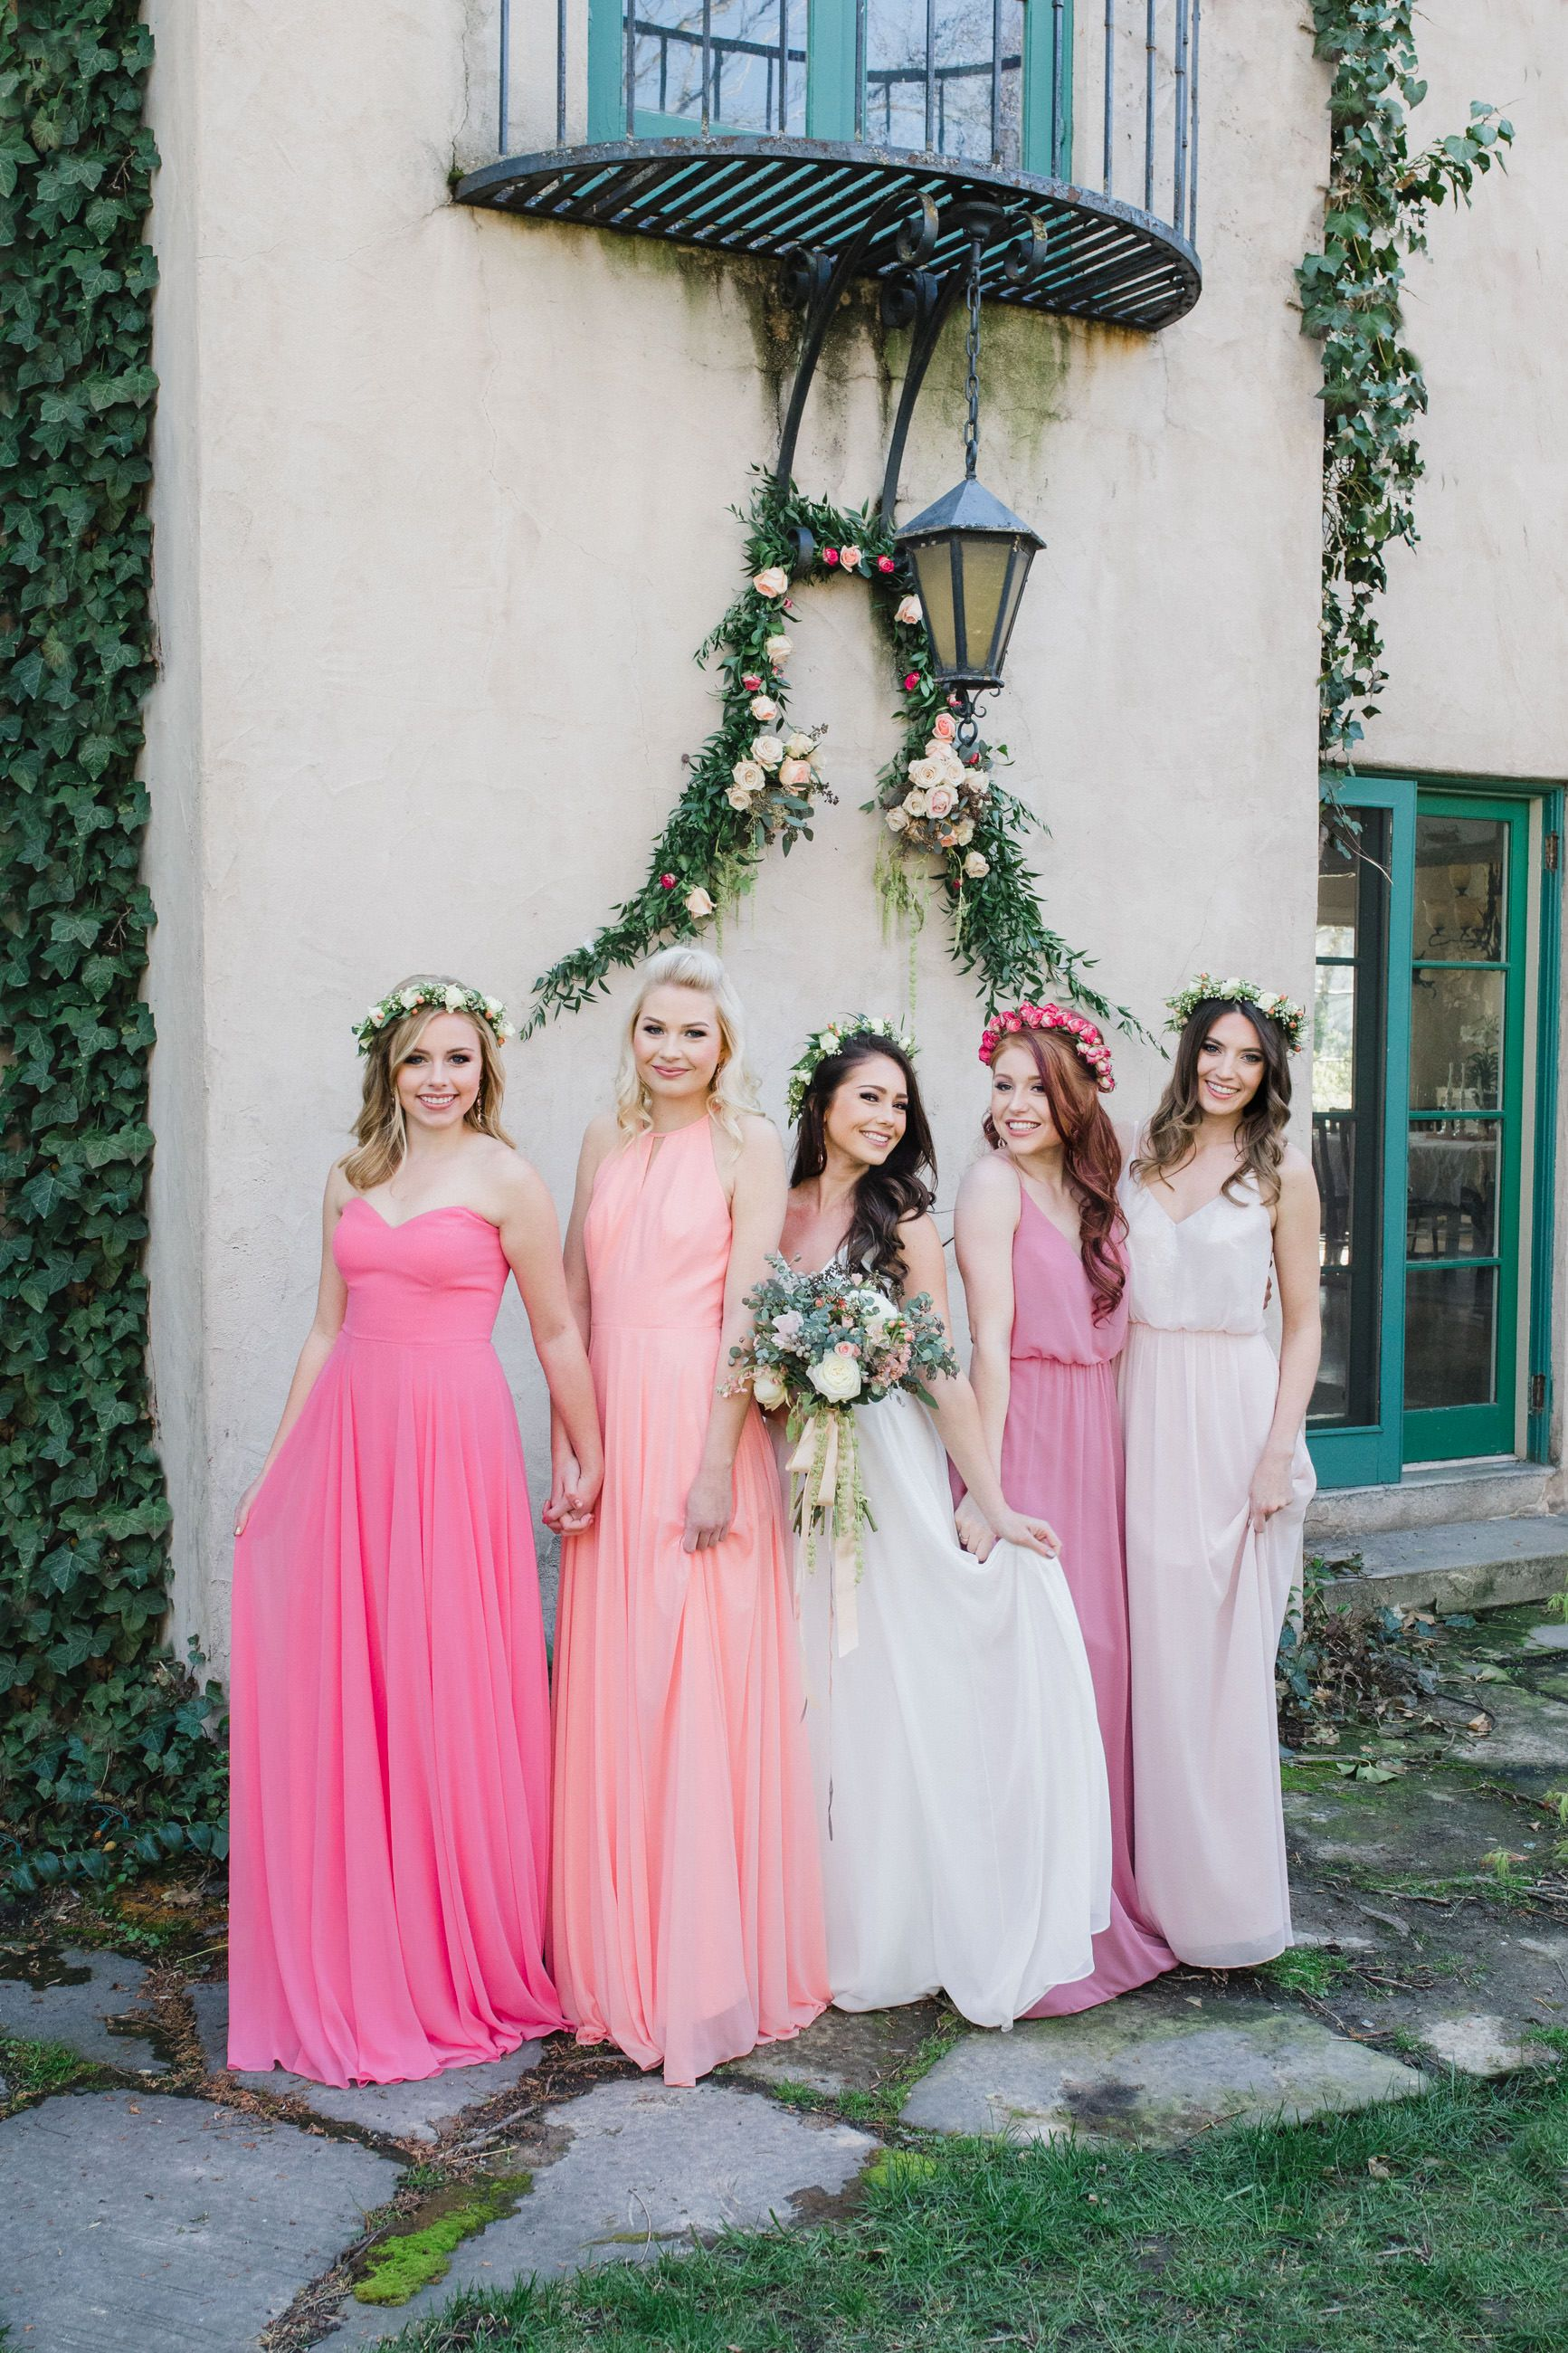 Bridesmaid dress ideas @dessygroup | Everything Wedding | Pinterest